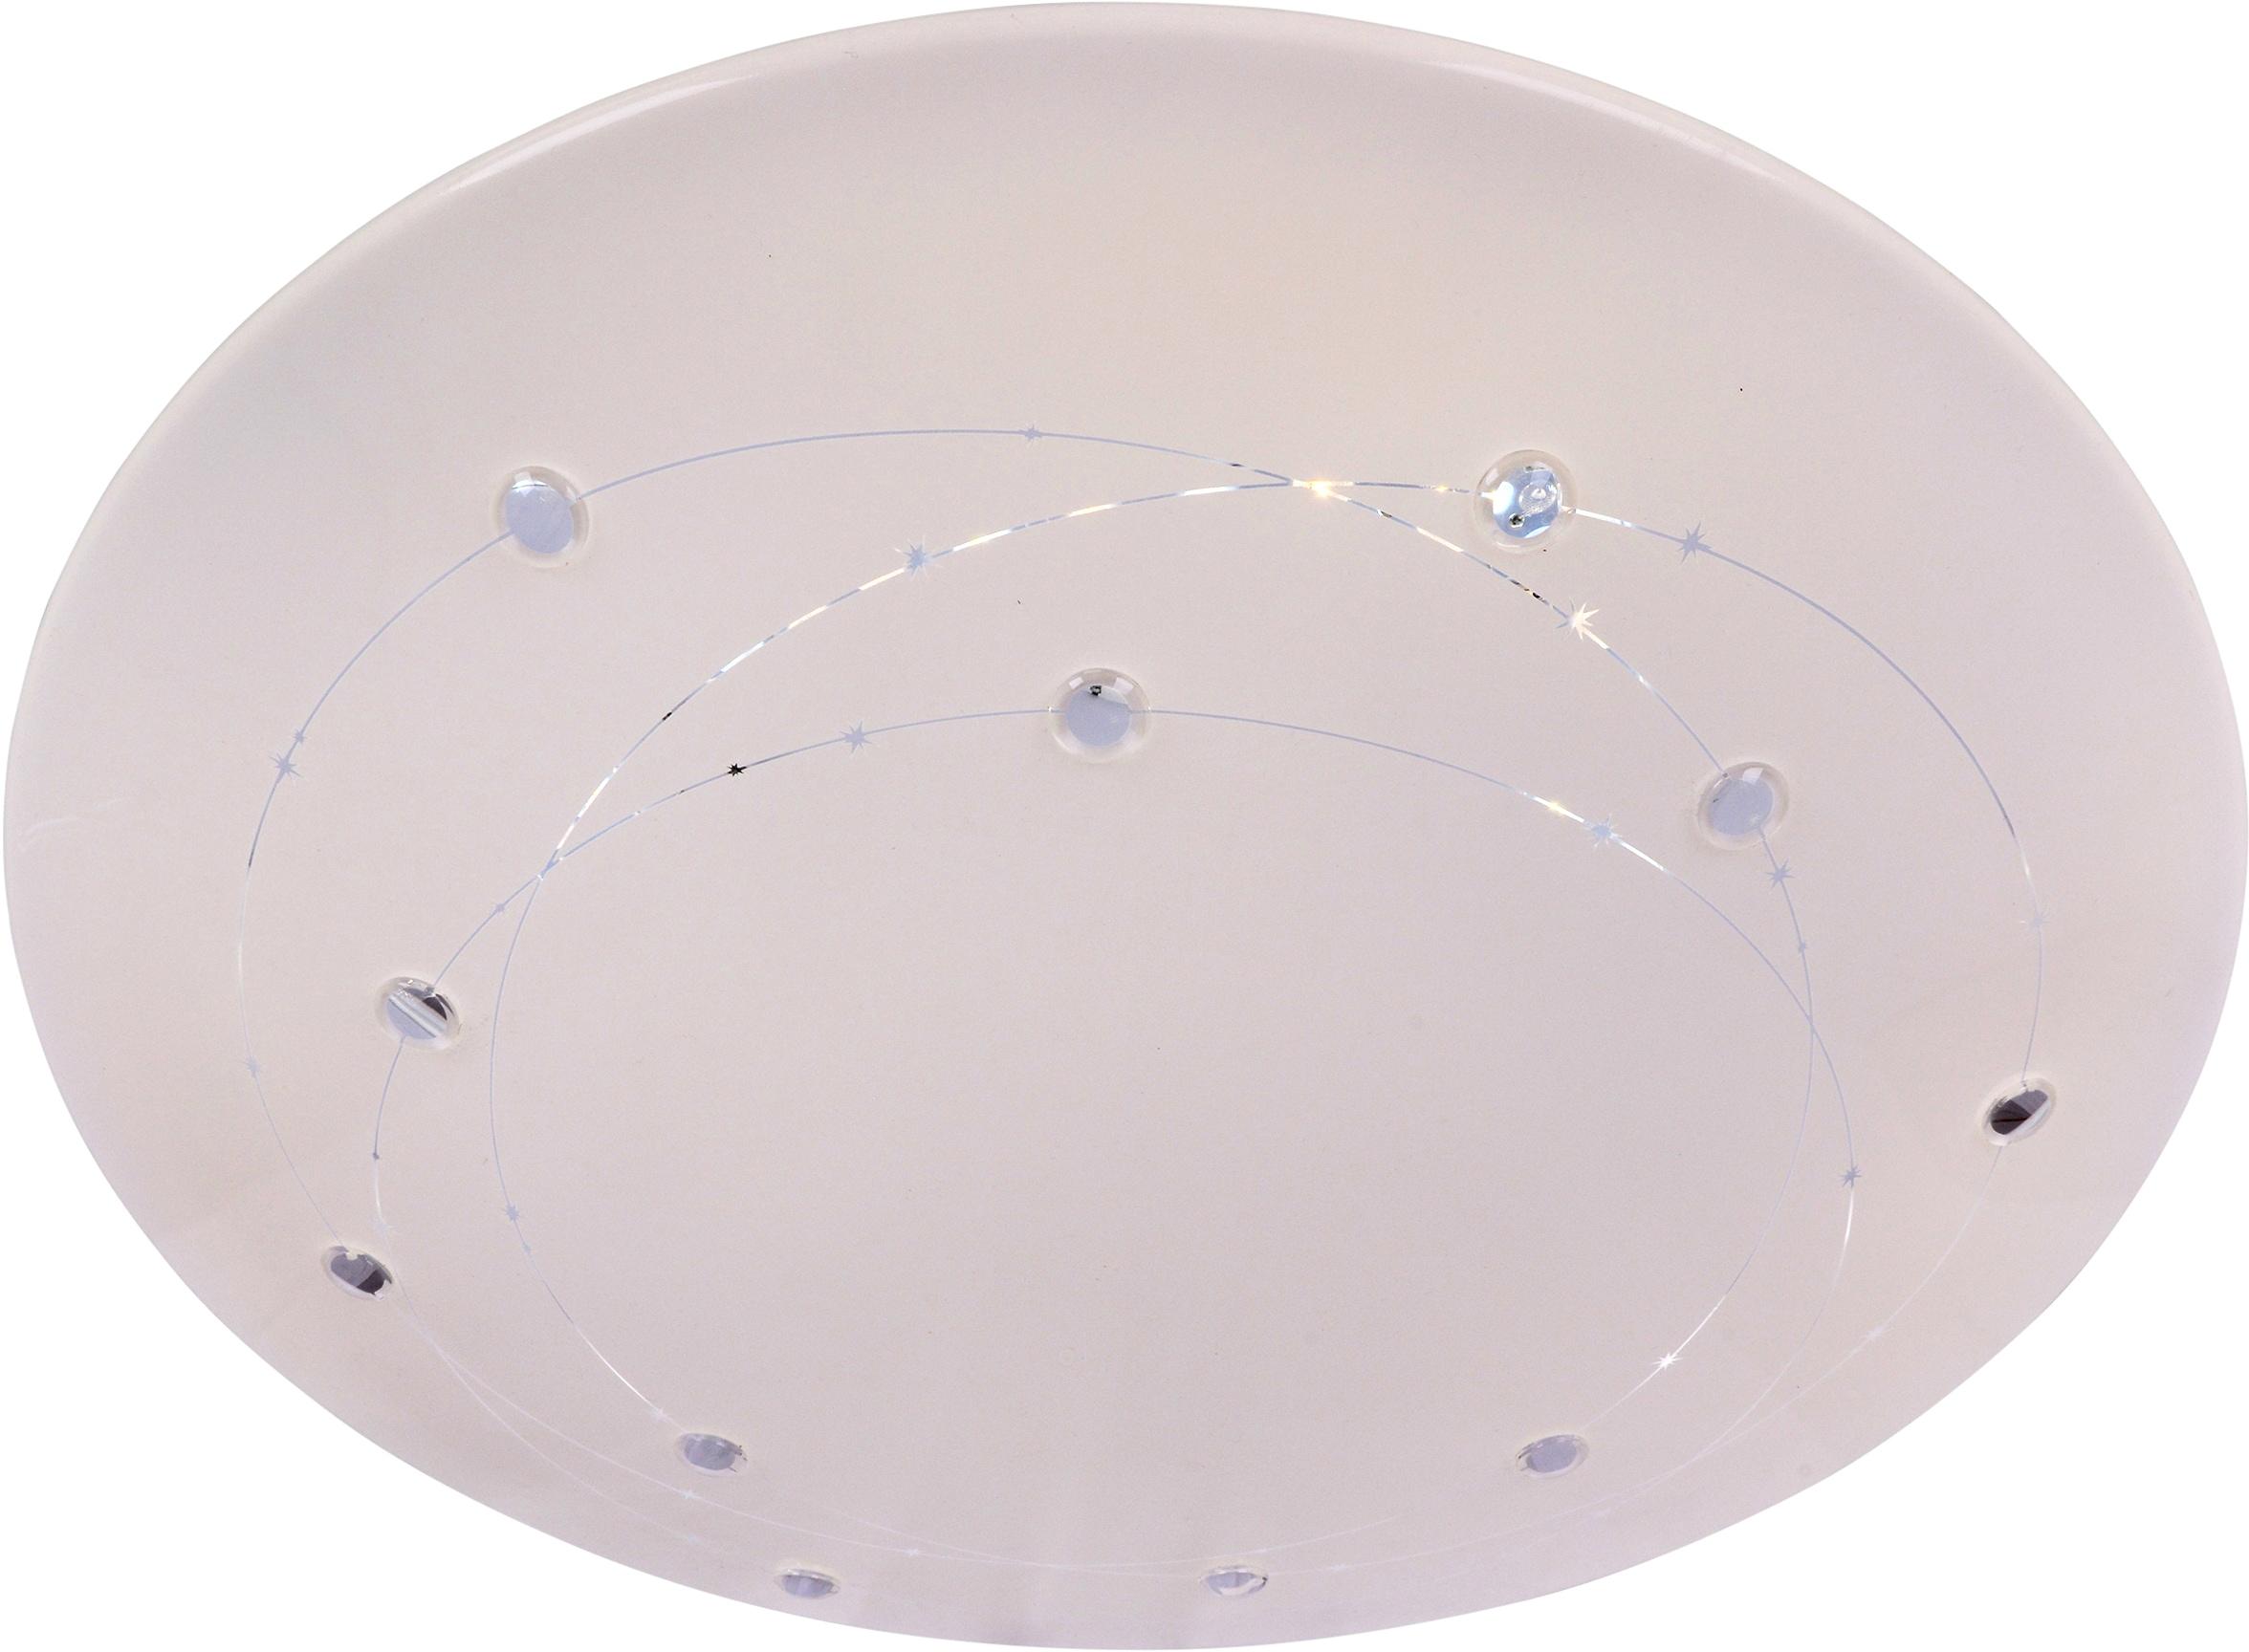 näve LED Deckenleuchte Lissabon, LED-Modul, Farbwechsler, Infrarot-Fernbedienung, Kristalleffekt, Farbwechsler, Memory- und Nachlichtfunktion, dimmbar, Ø 60 cm